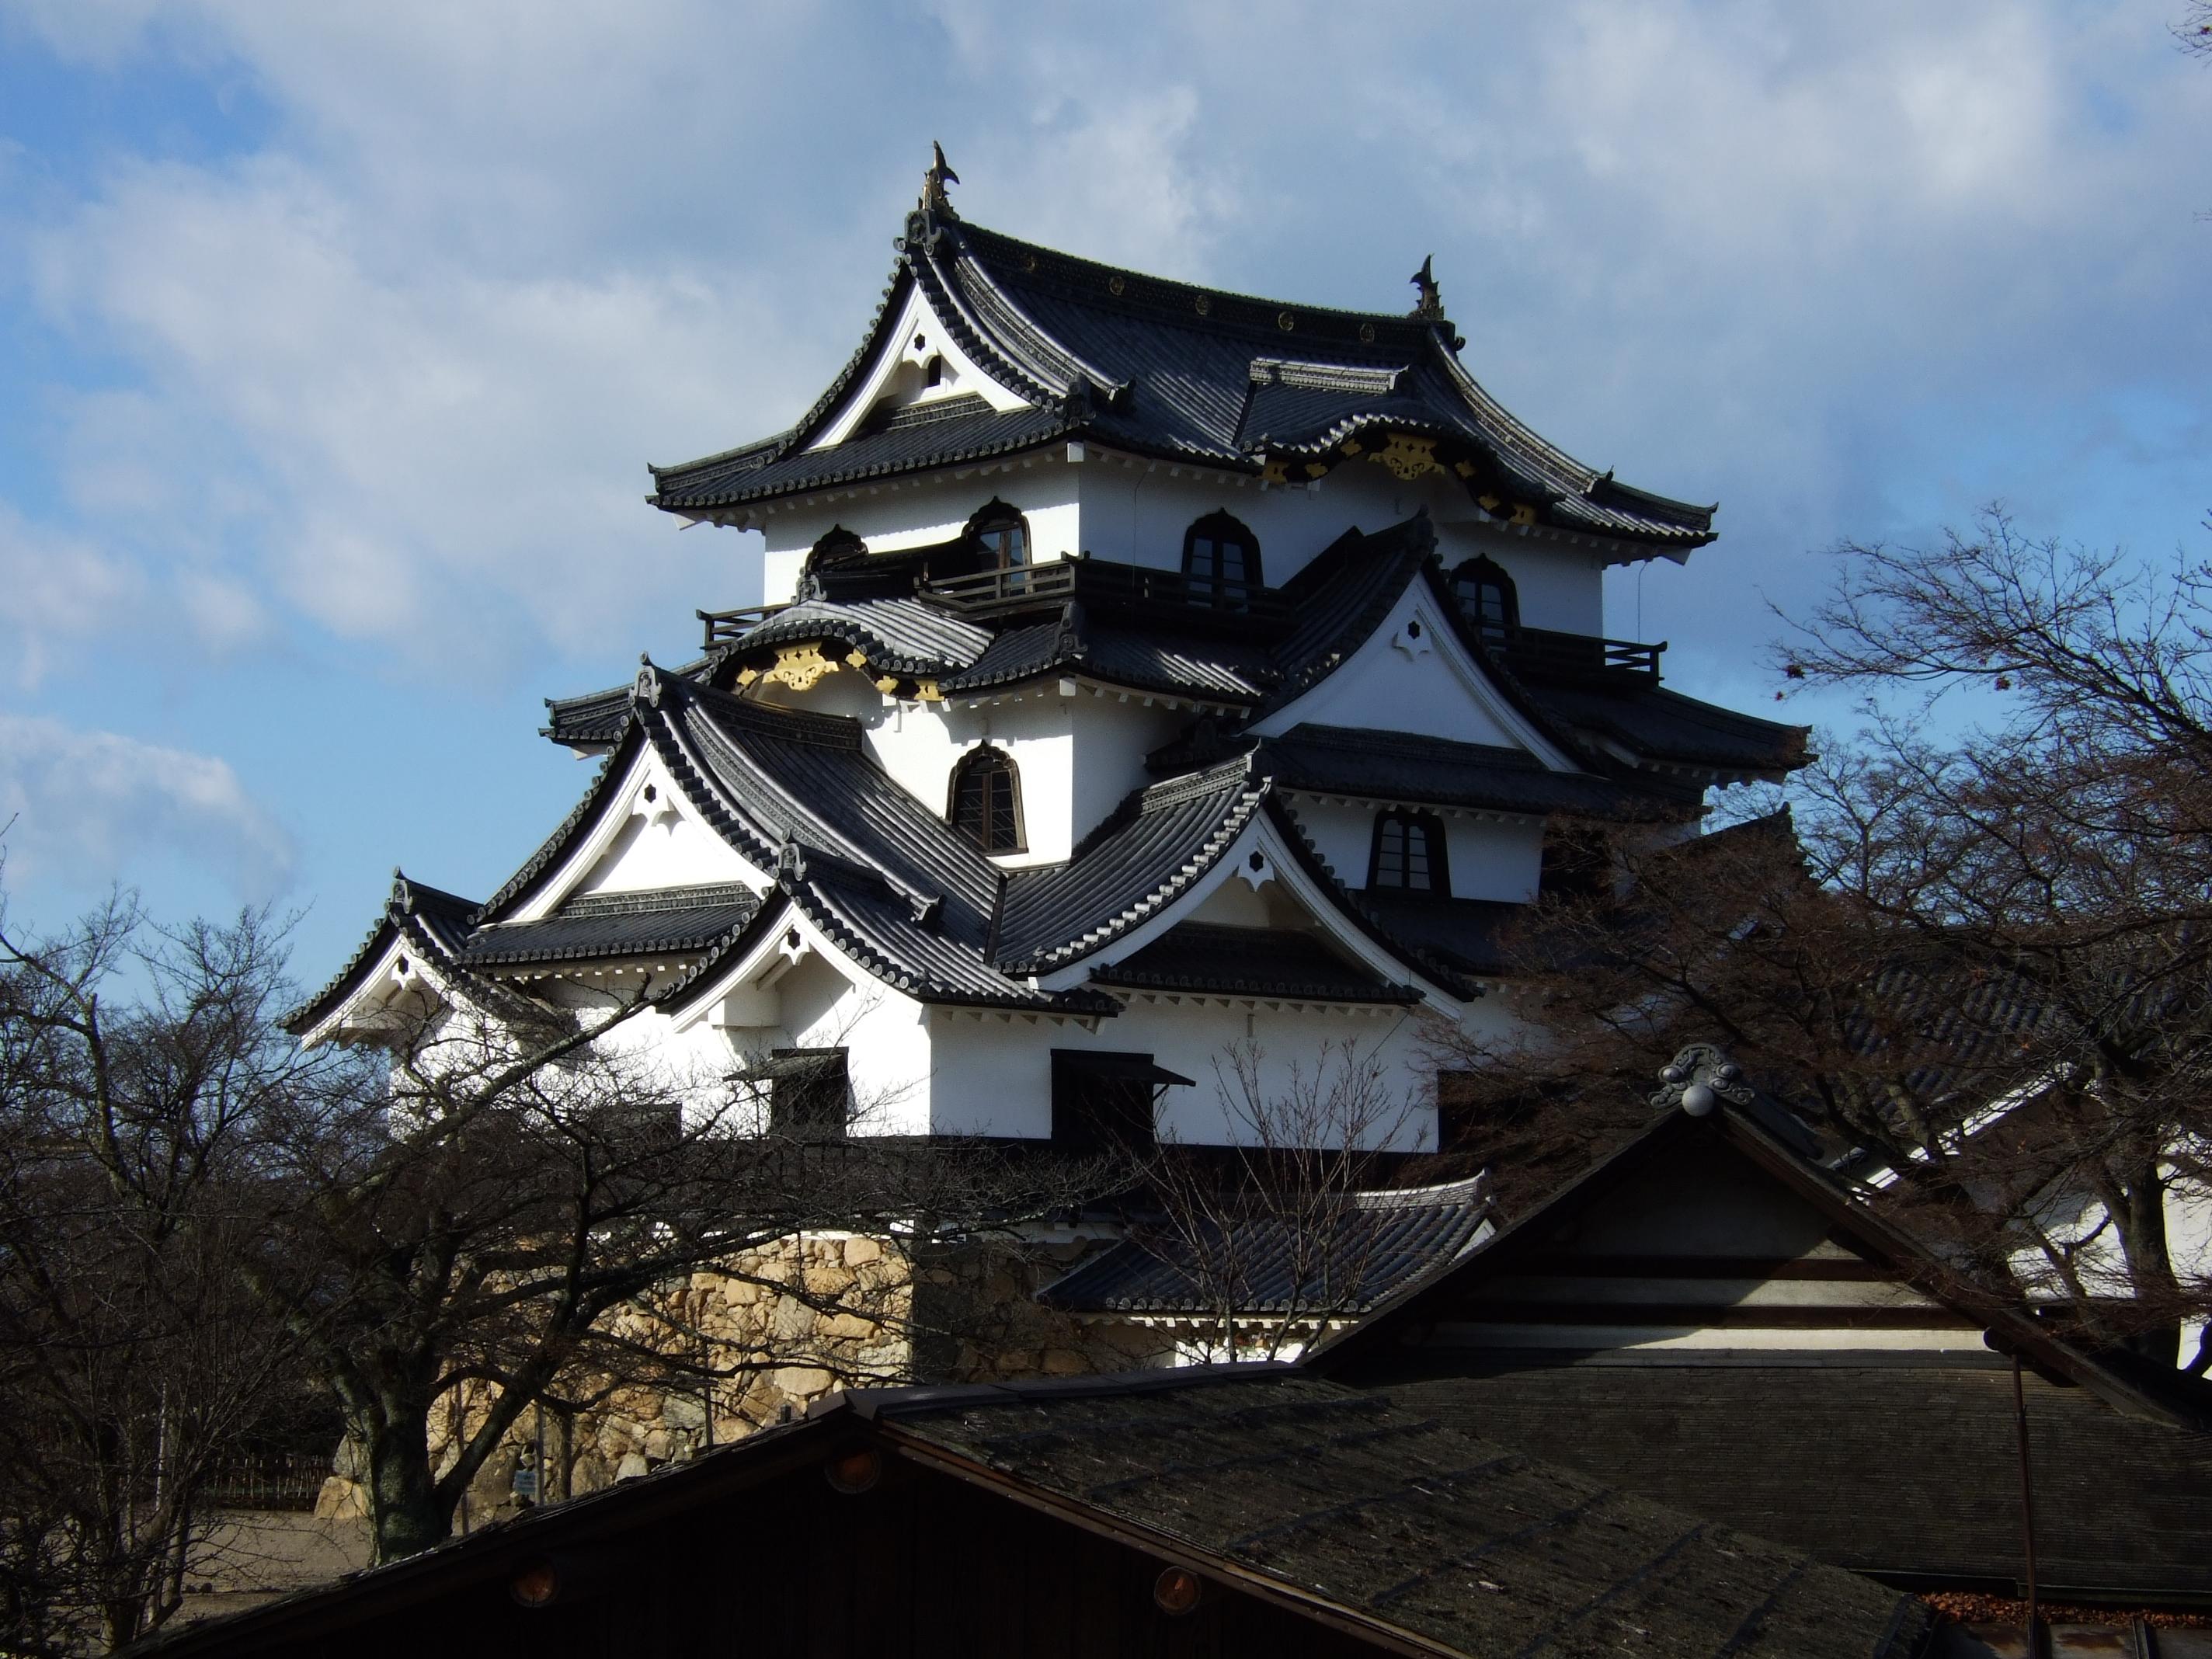 Original Japan castle